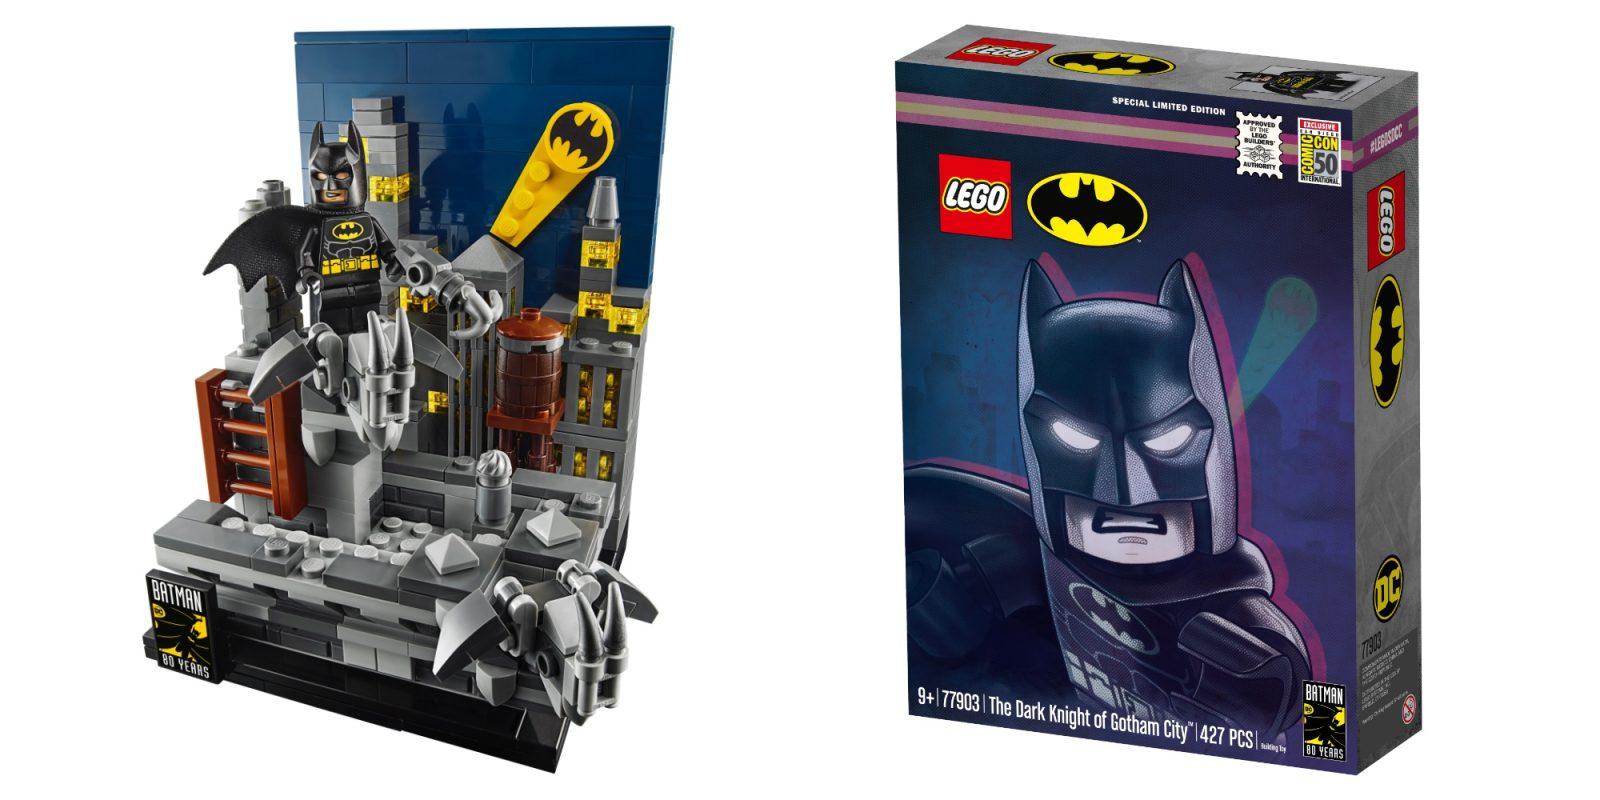 LEGO unveils new Batman Dark Knight of Gotham City kit as the next SDCC build